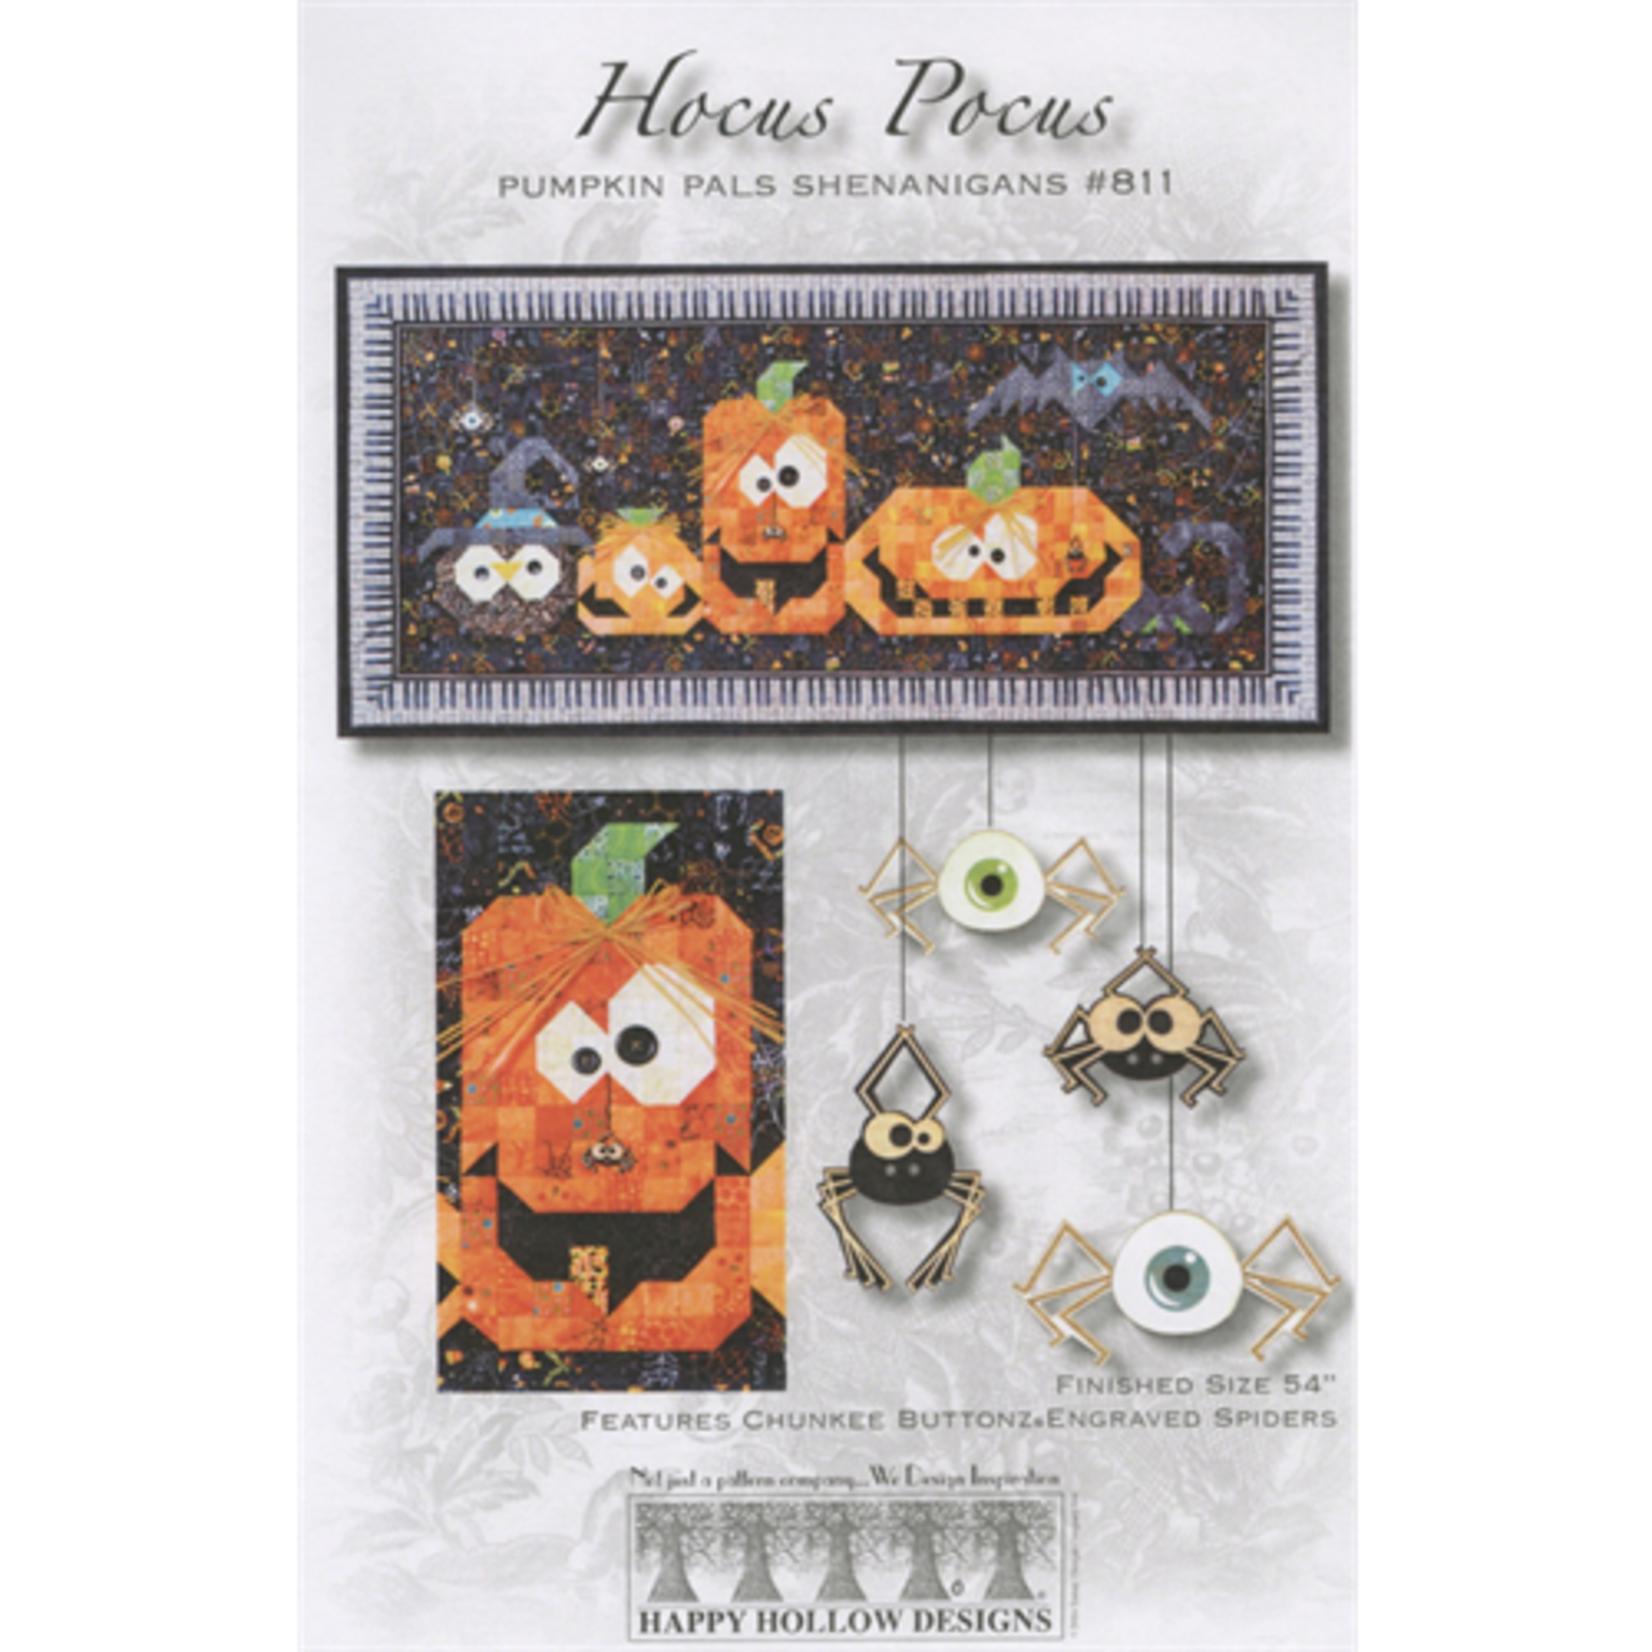 Happy Hollow Designs Hocus Pocus Pumpkins Pattern #811